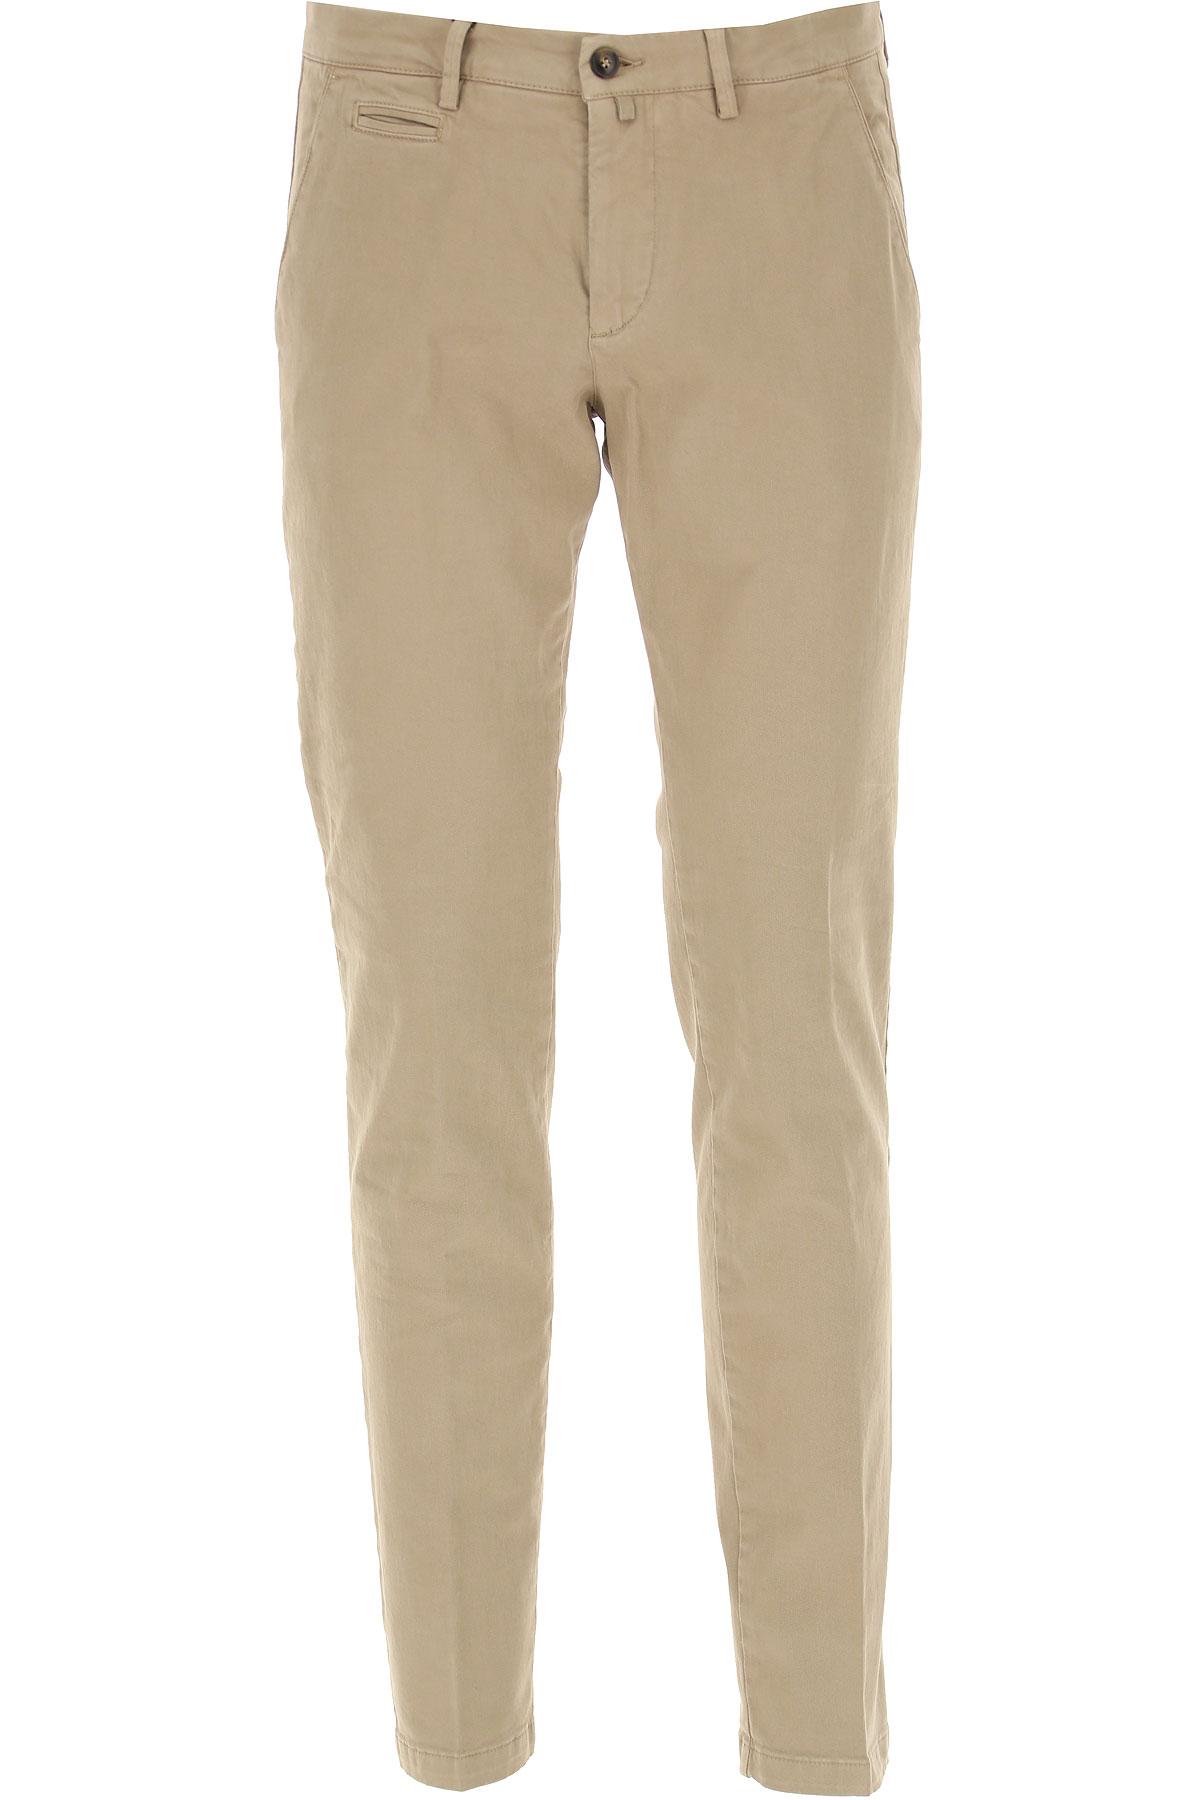 Briglia Pantalon Homme, Beige, Coton, 2019, 48 50 54